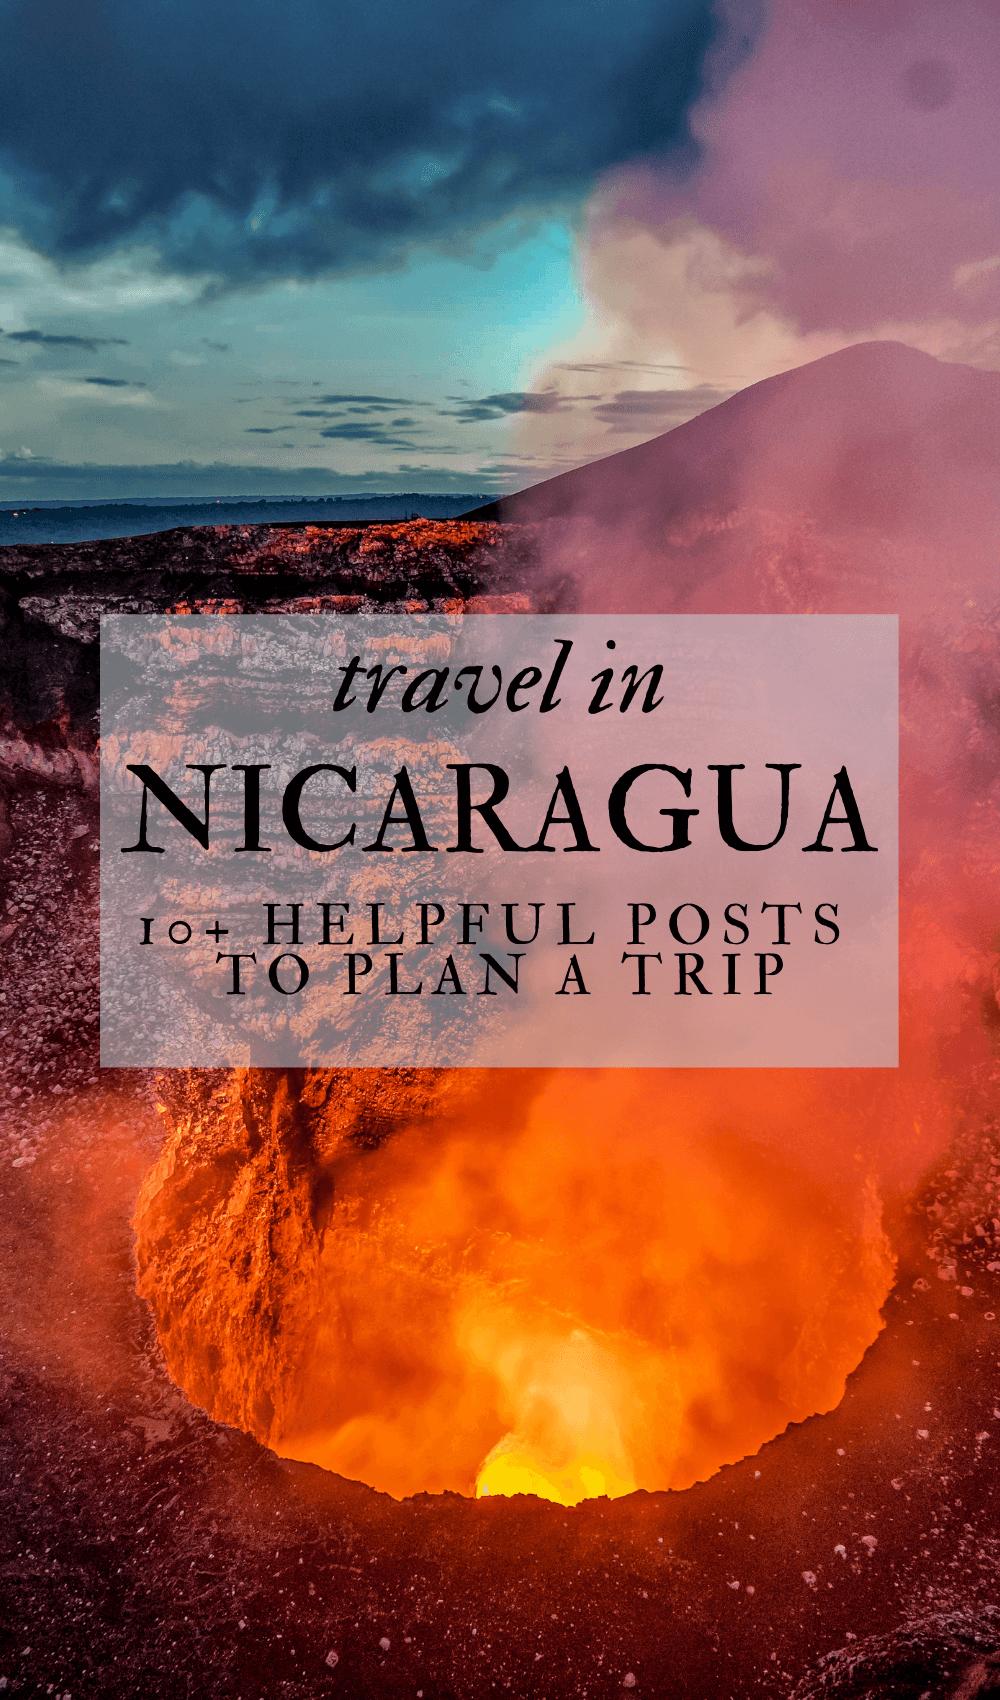 GLOBAL DIRECTORY: NICARAGUA